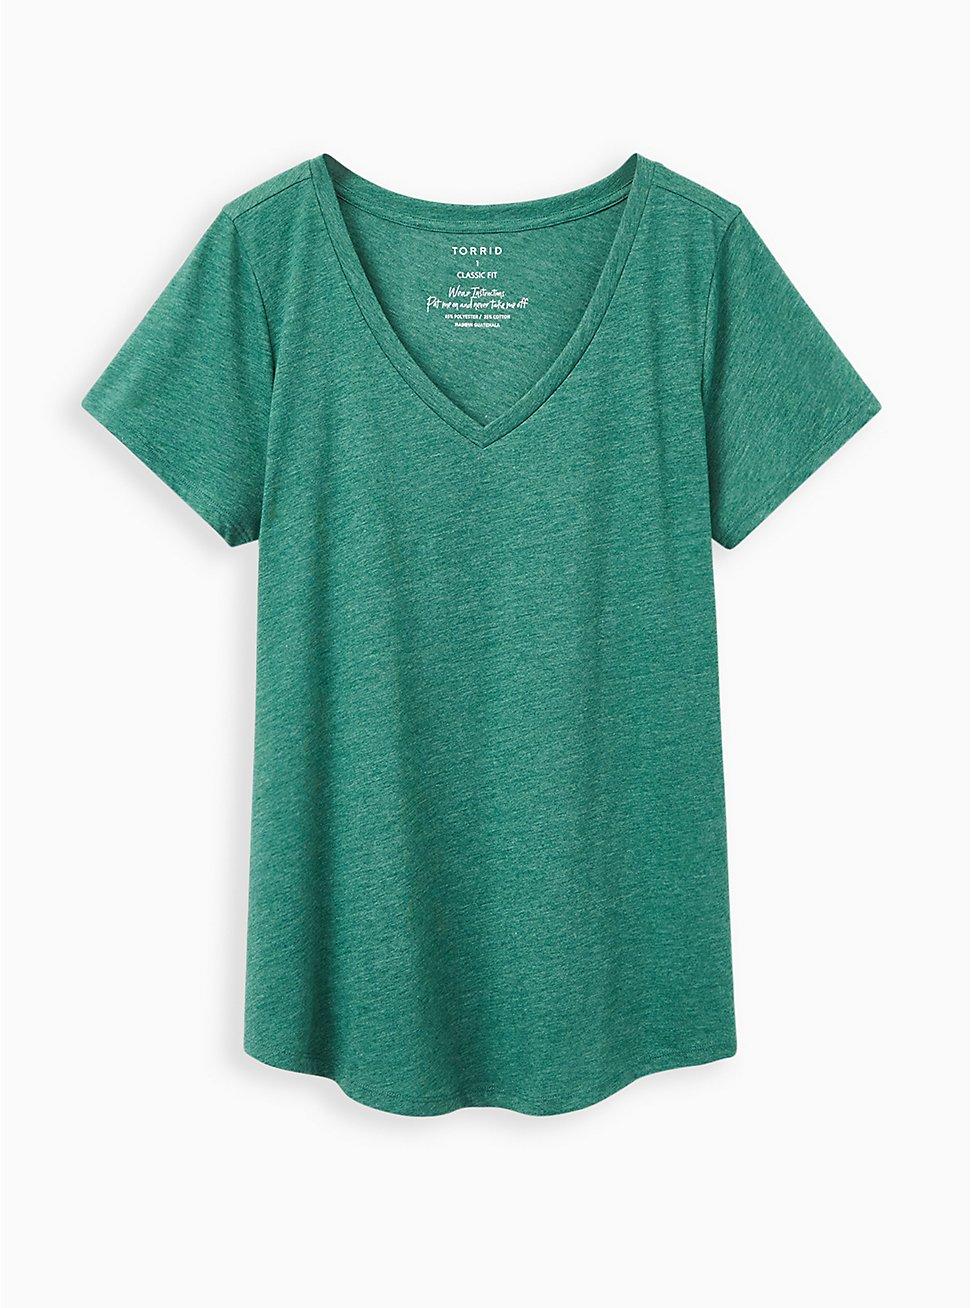 Girlfriend Tee - Signature Jersey Green, GREEN, hi-res